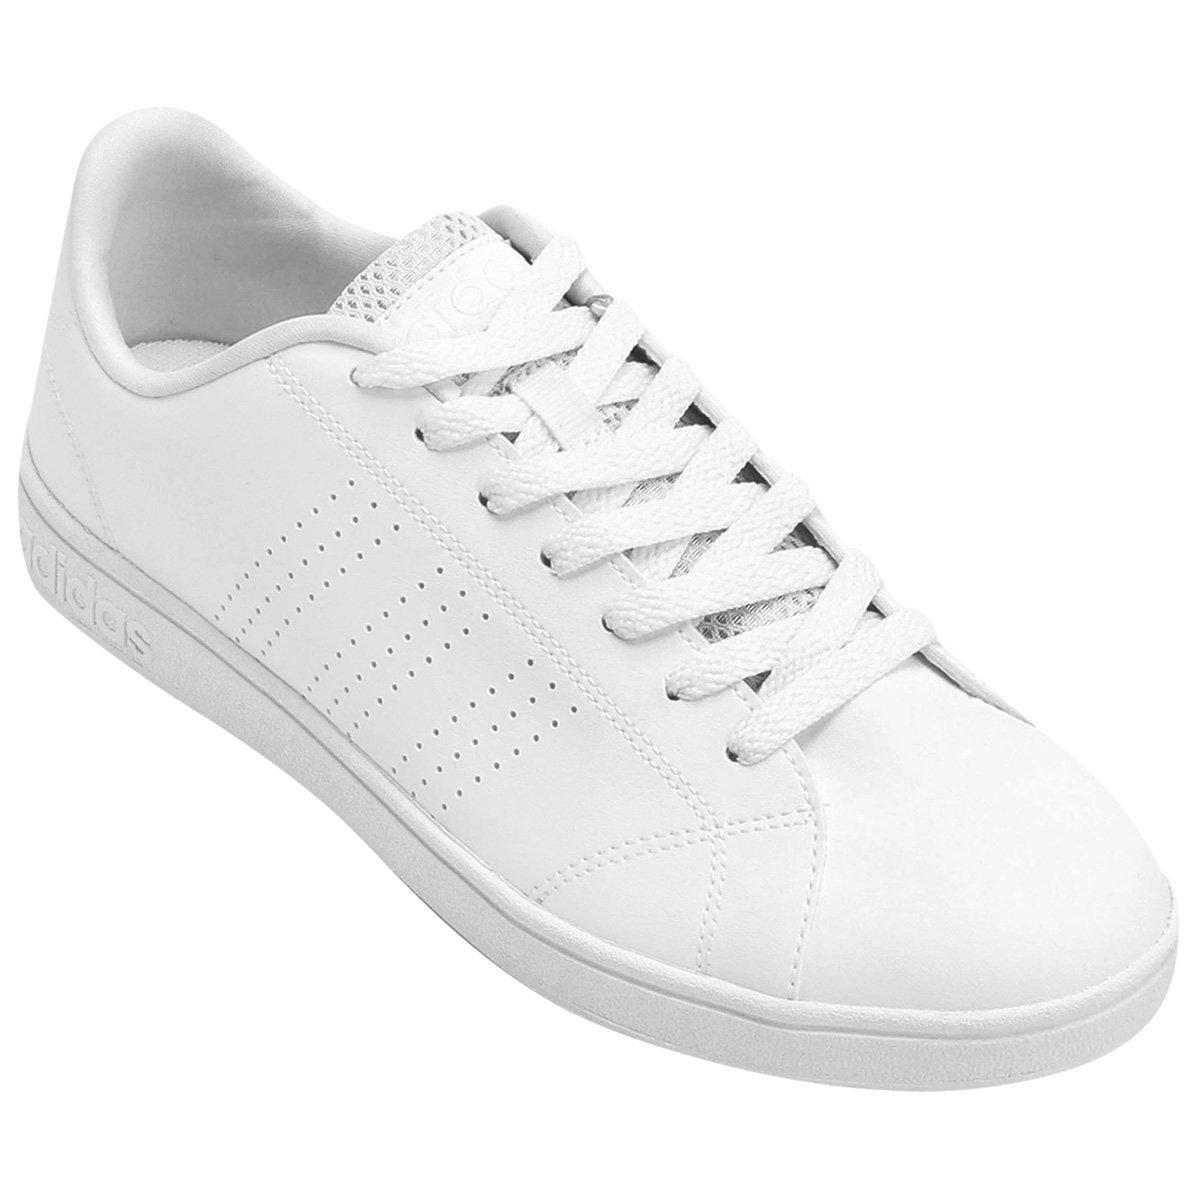 Tênis Adidas Vs Advantage Clean Masculino Branco